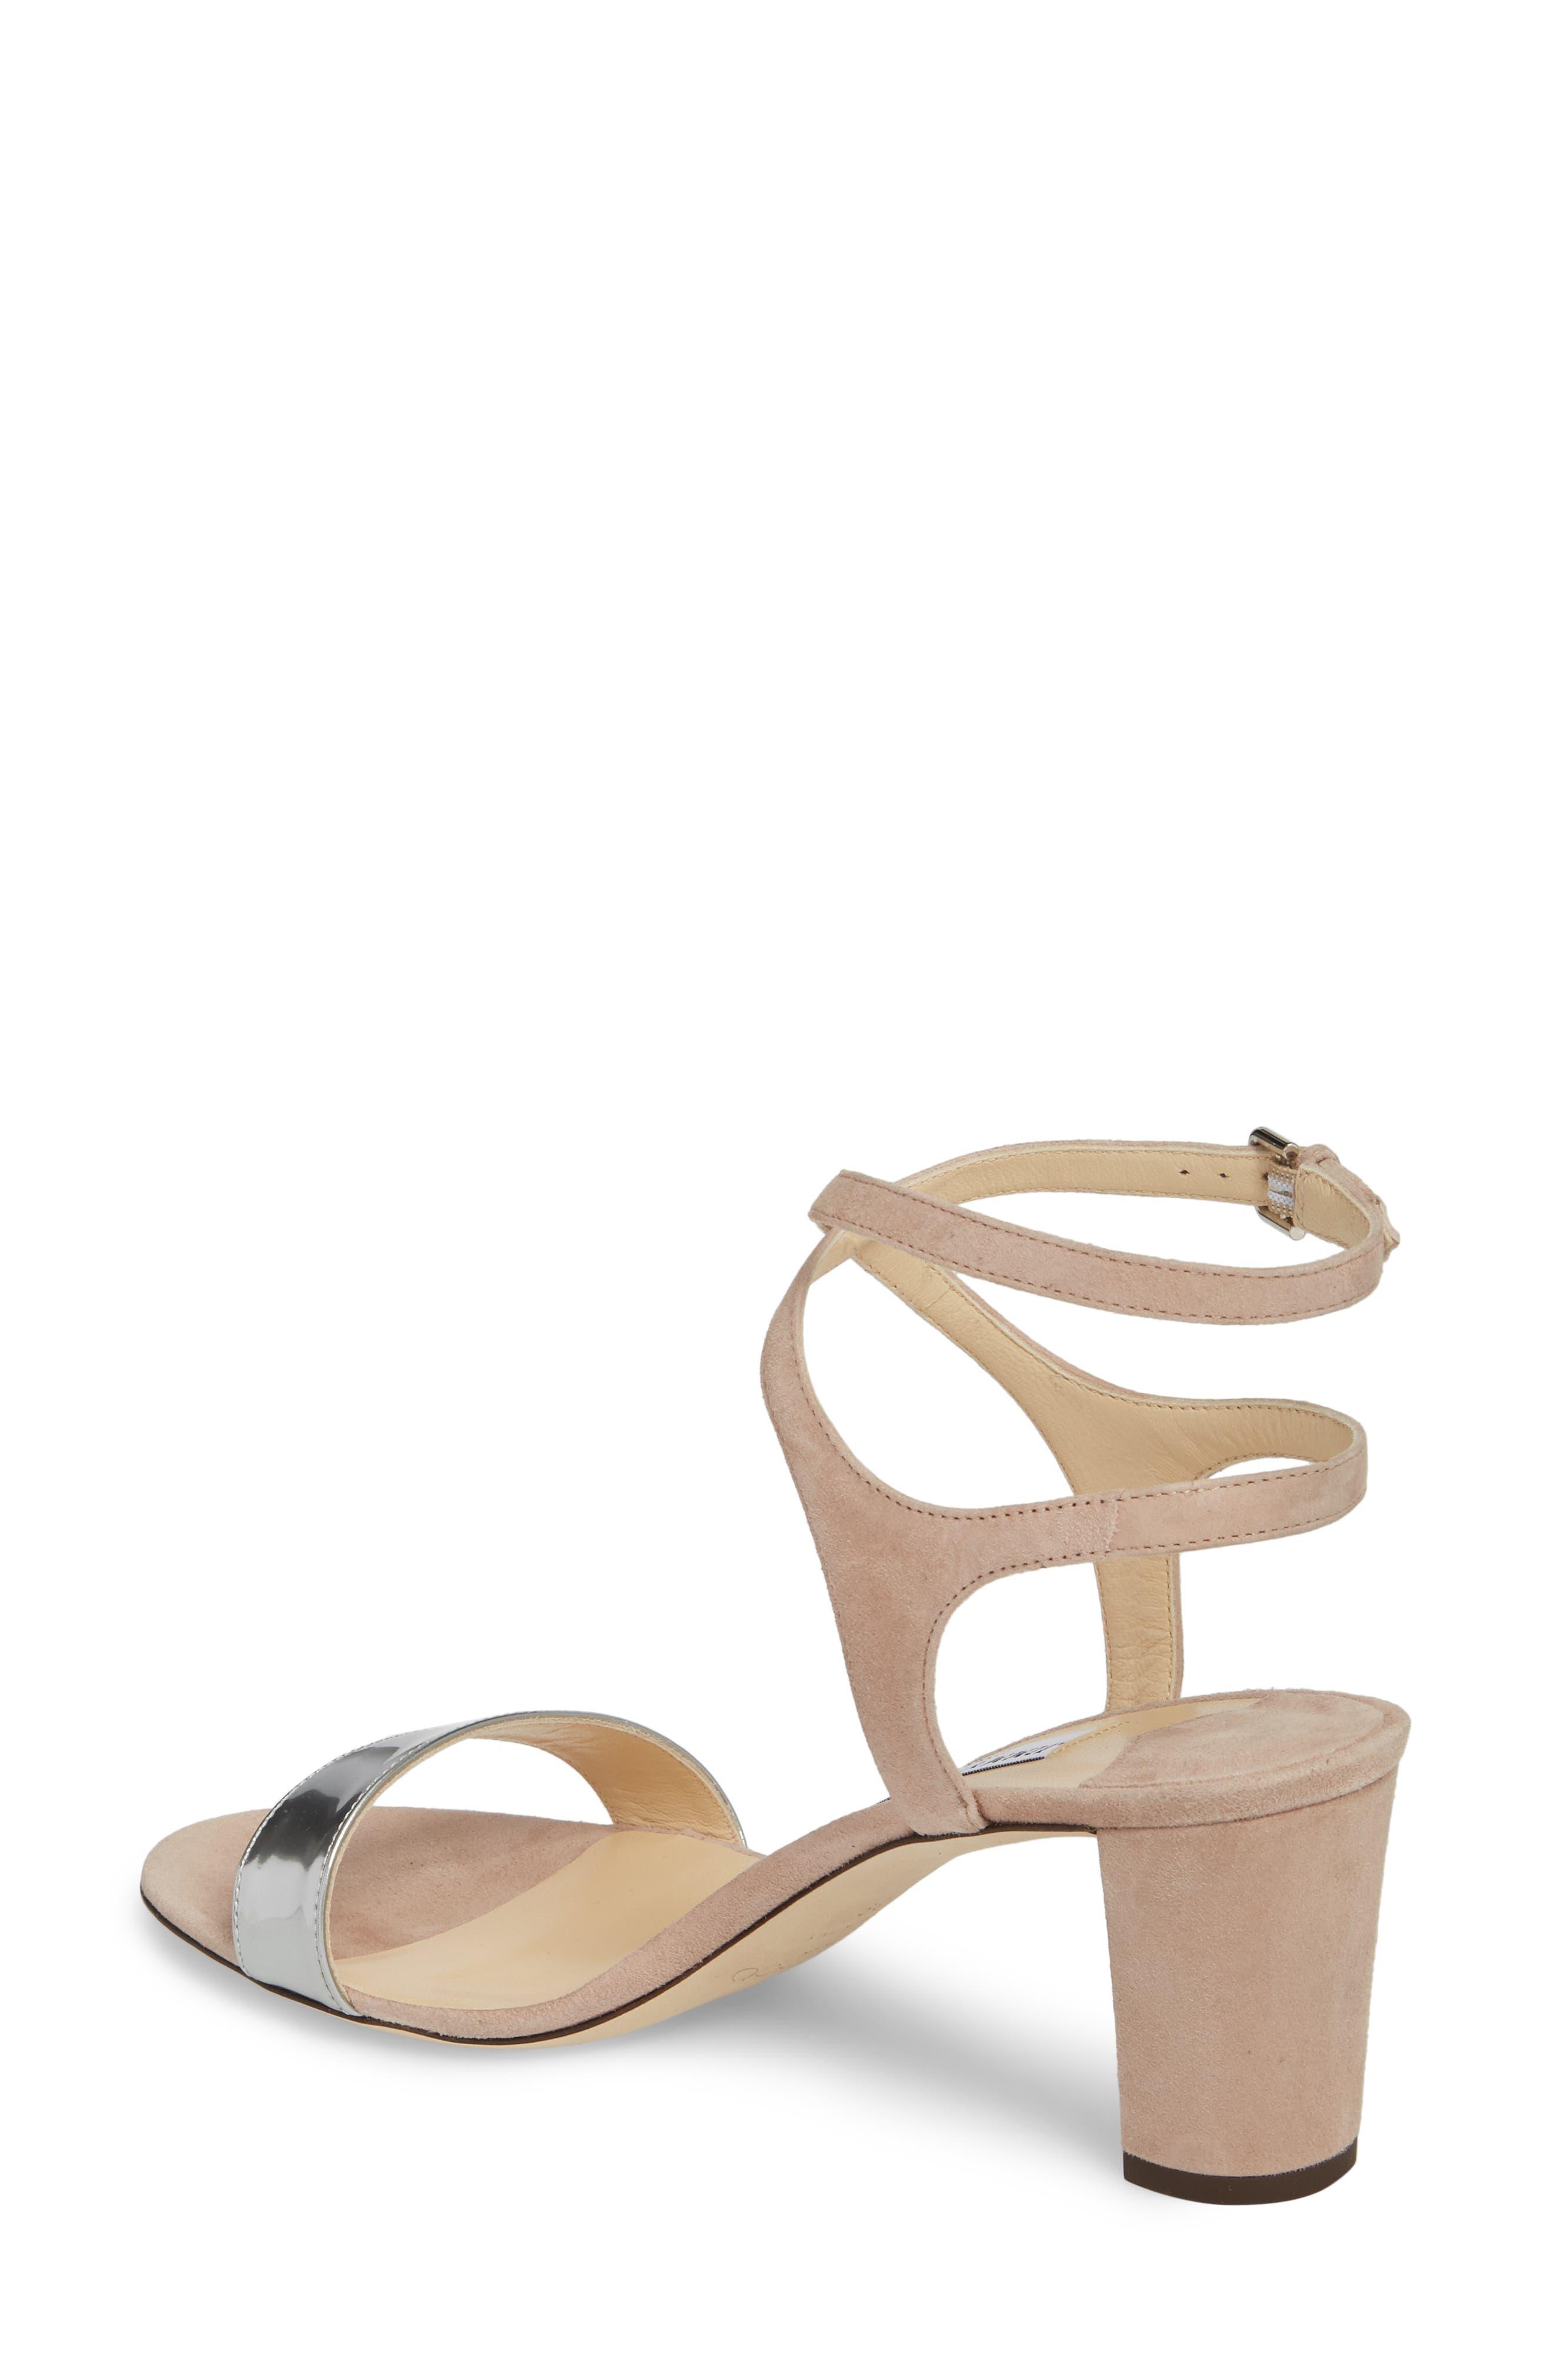 Marine Sandal,                             Alternate thumbnail 2, color,                             Ballet Pink